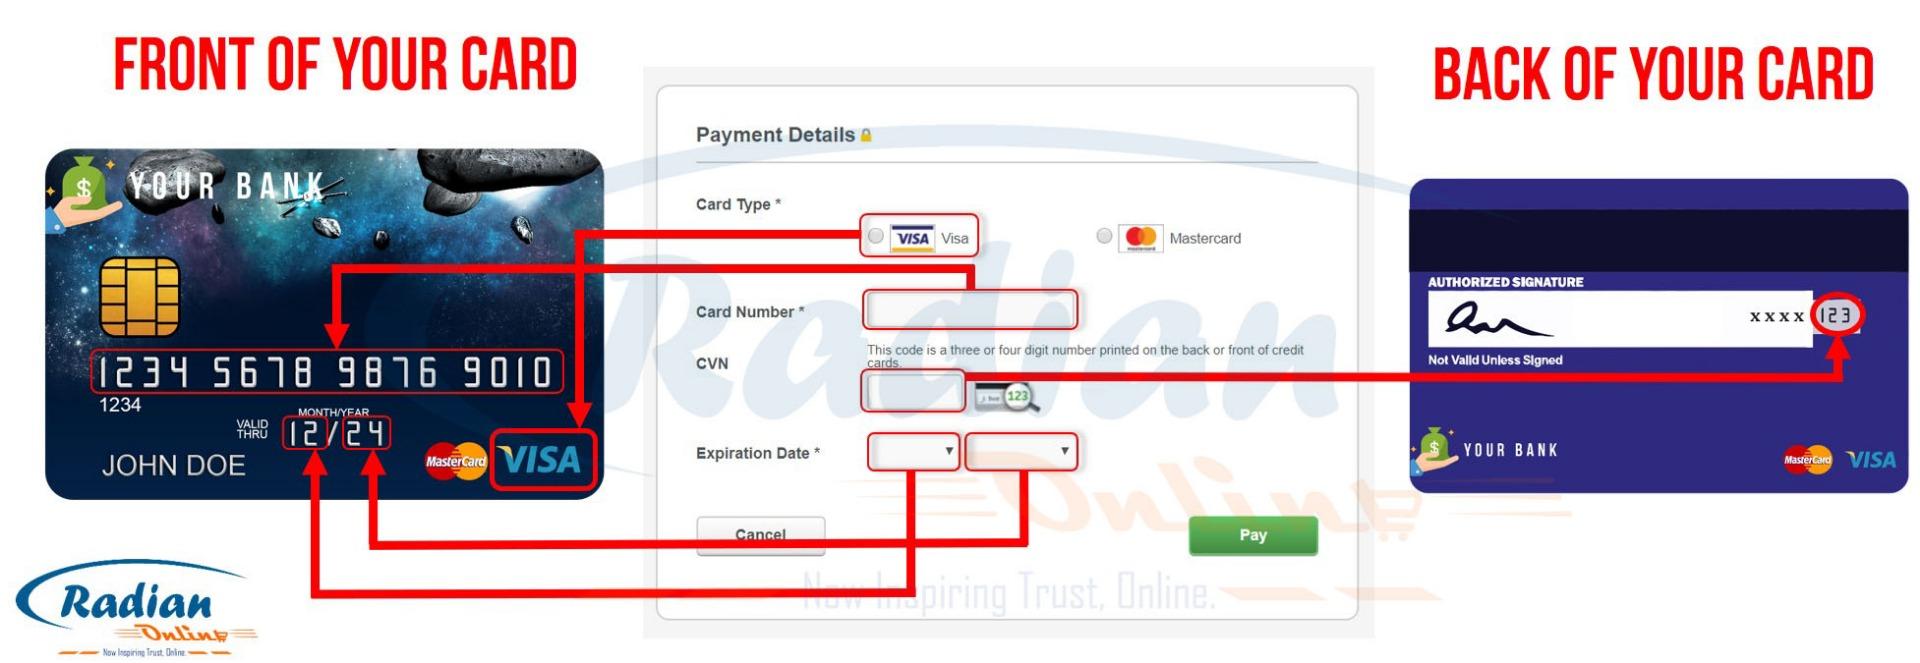 Radian Online Visa Infographic Card